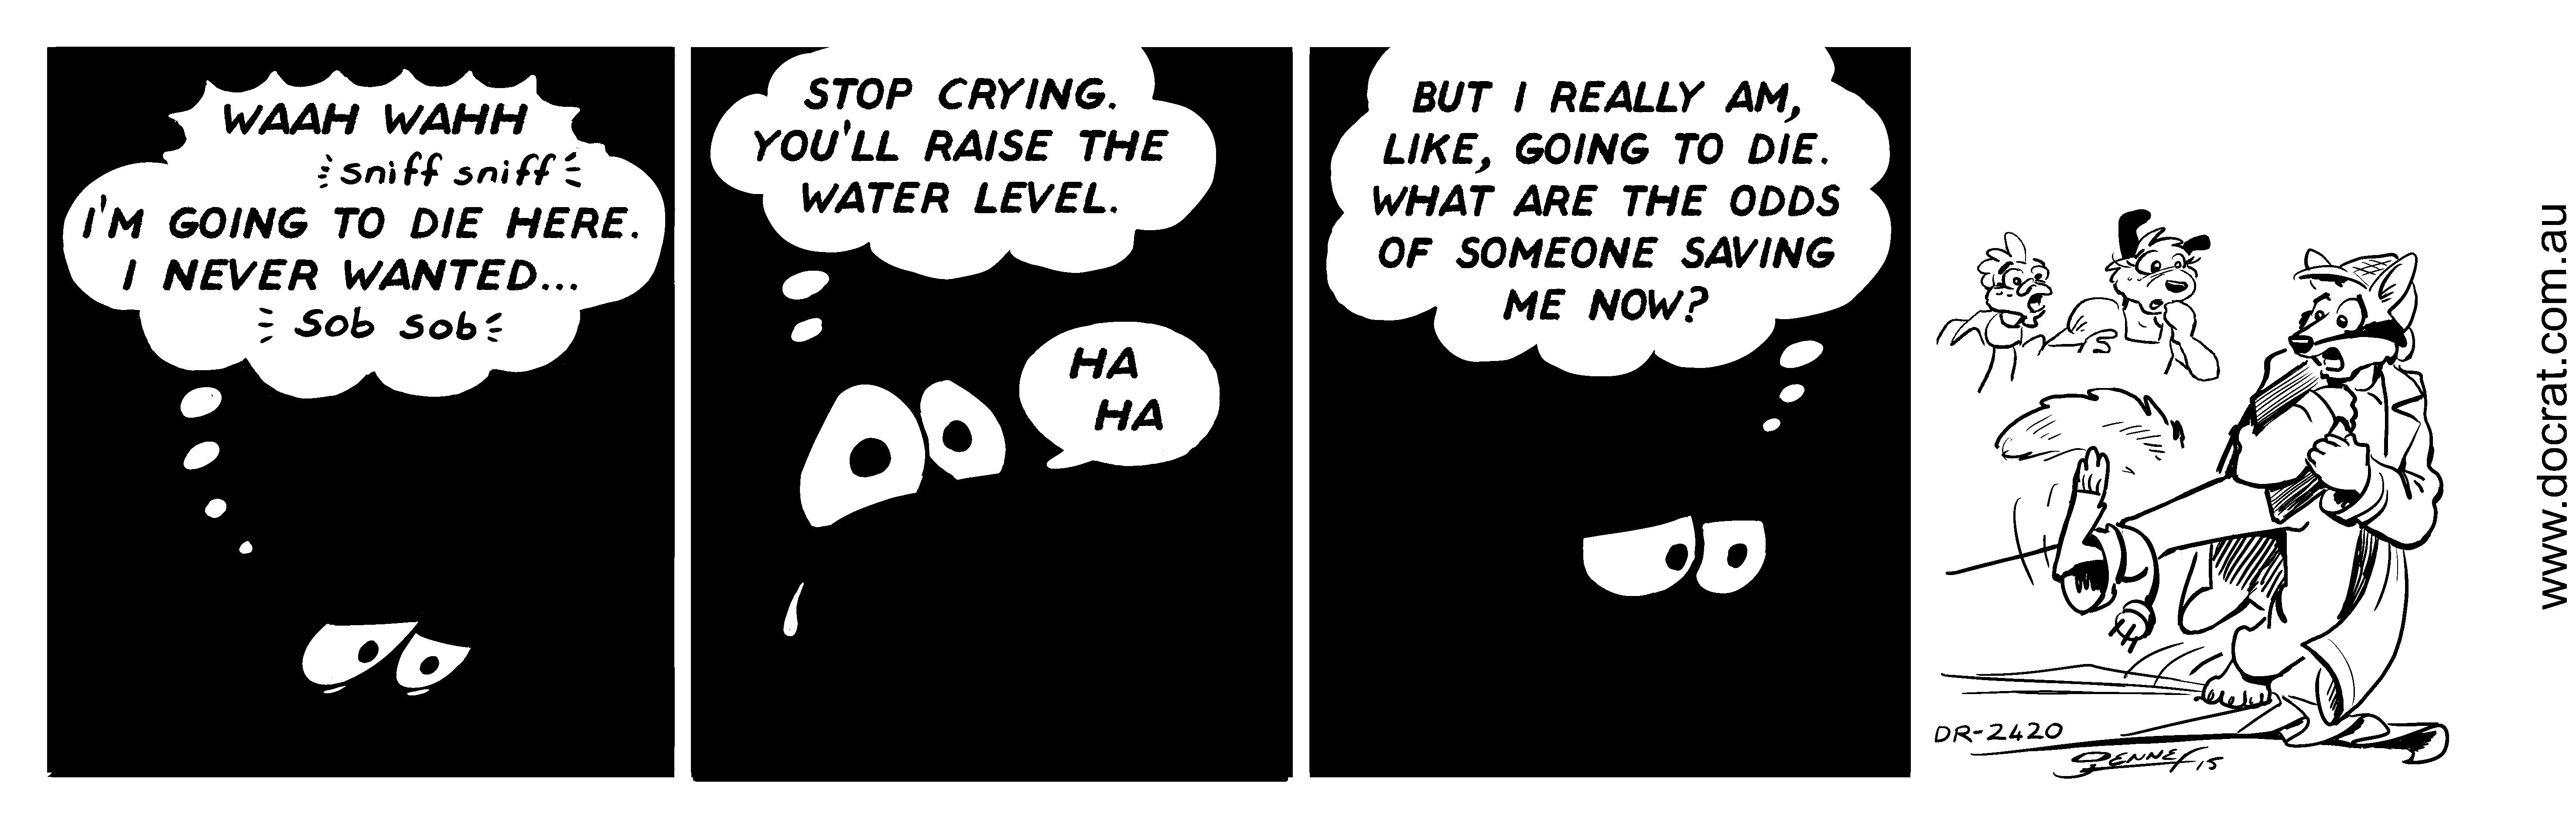 20151218